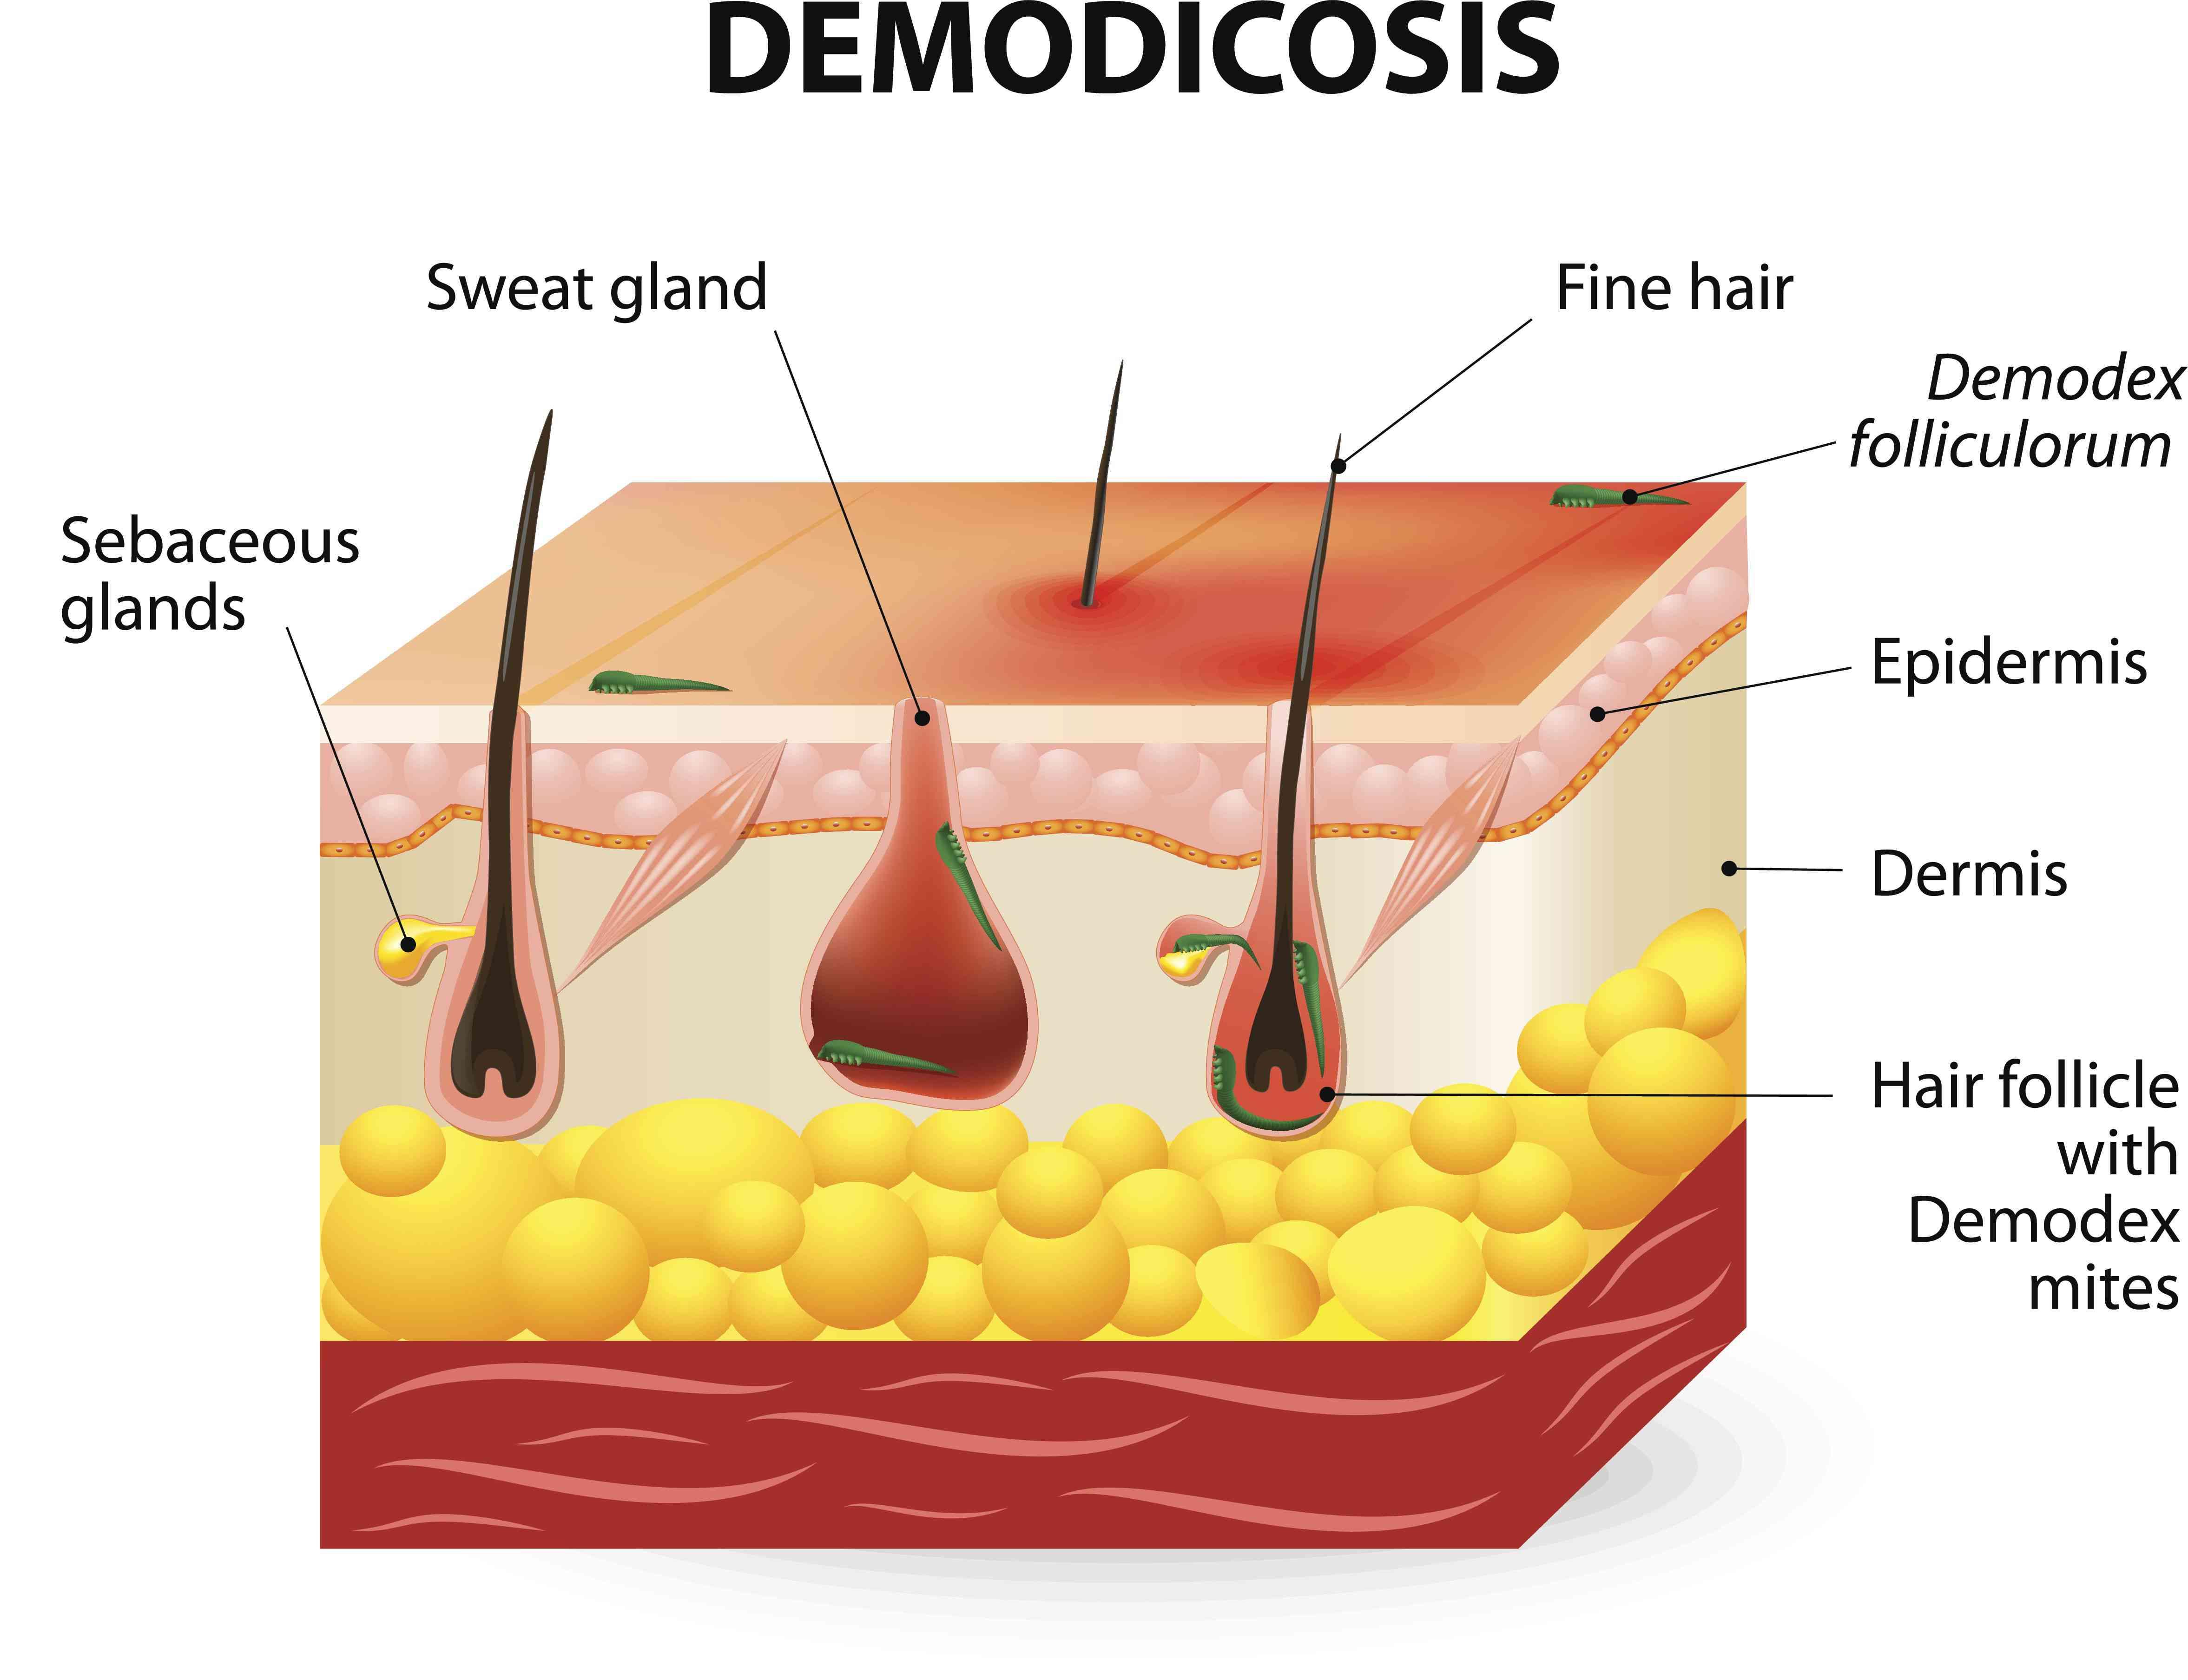 Demodicosis illustration